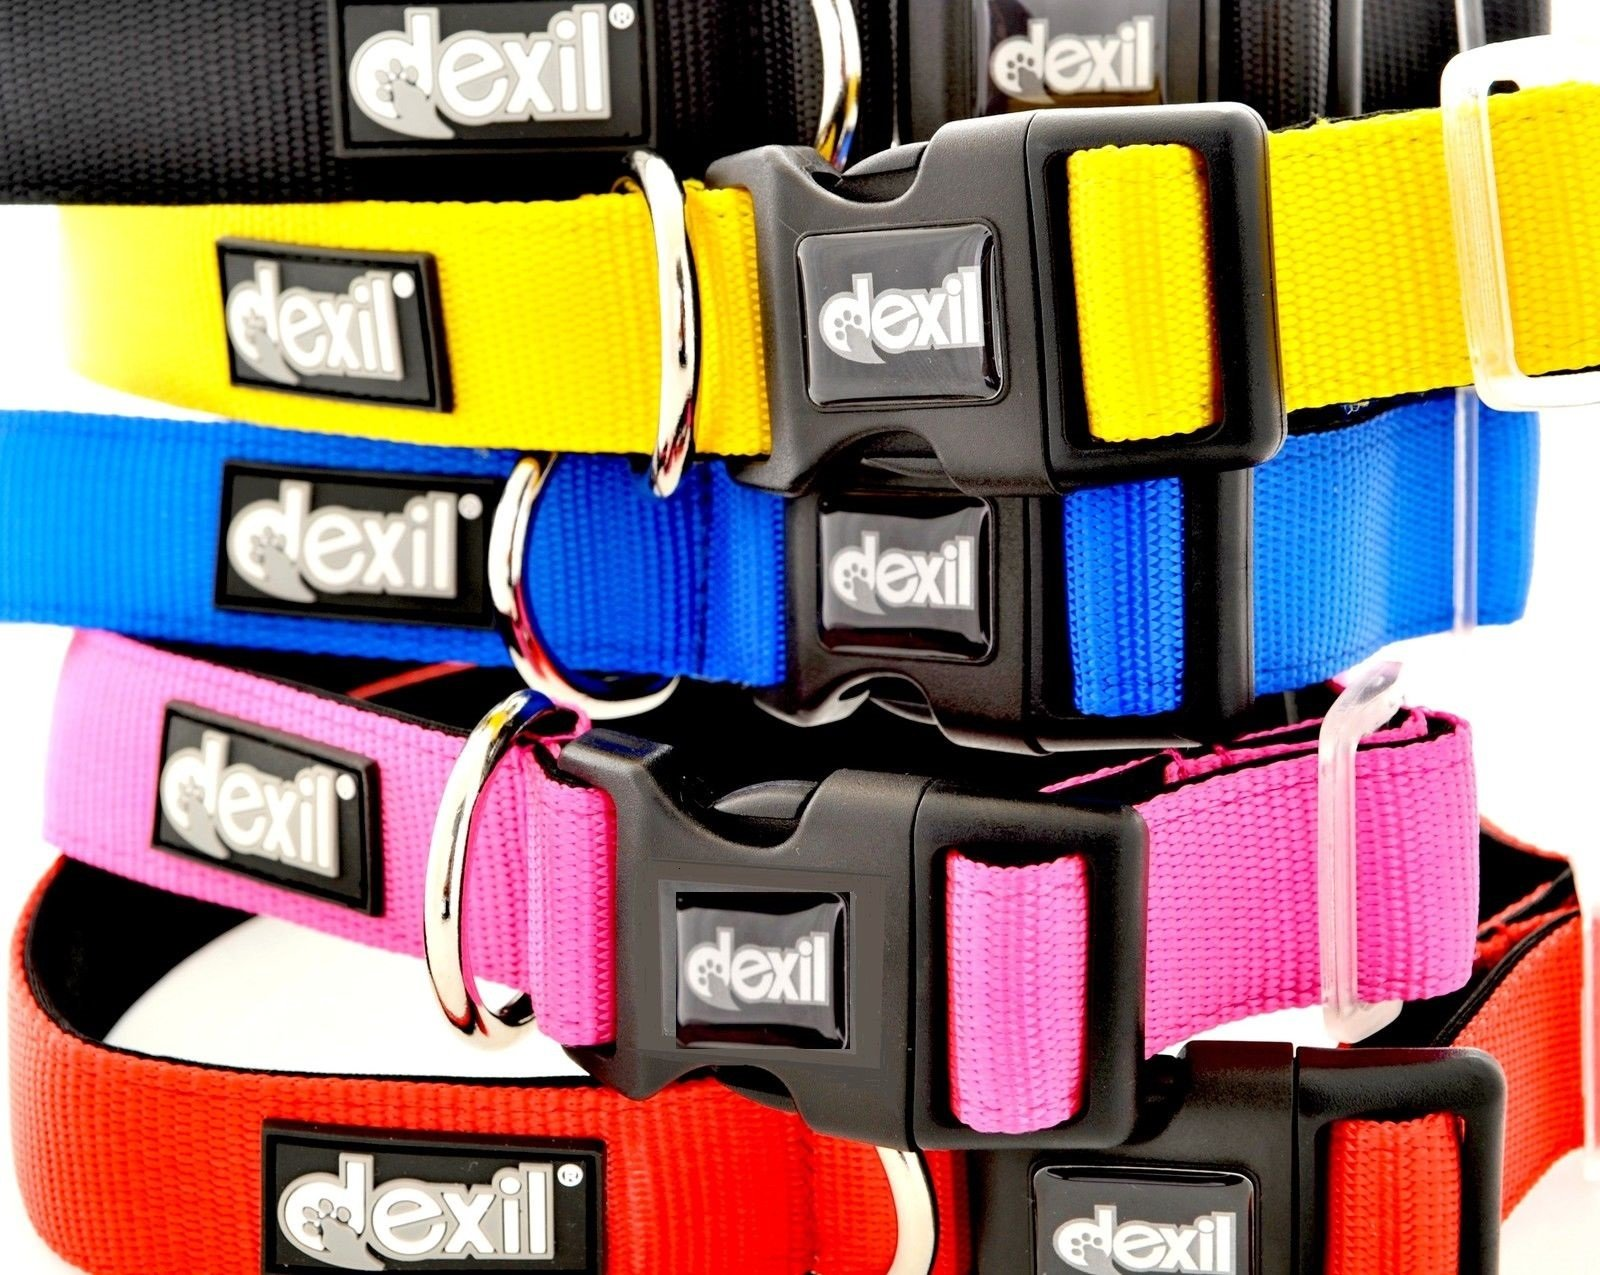 LIFETIME GUARANTEE! Dexil Elite Range Luxury Neoprene Padded Extra Strong Adjustable Large-XXL Pet Dog Collar (Flash Red, Large-XL 15-25inch x 1.25inch)